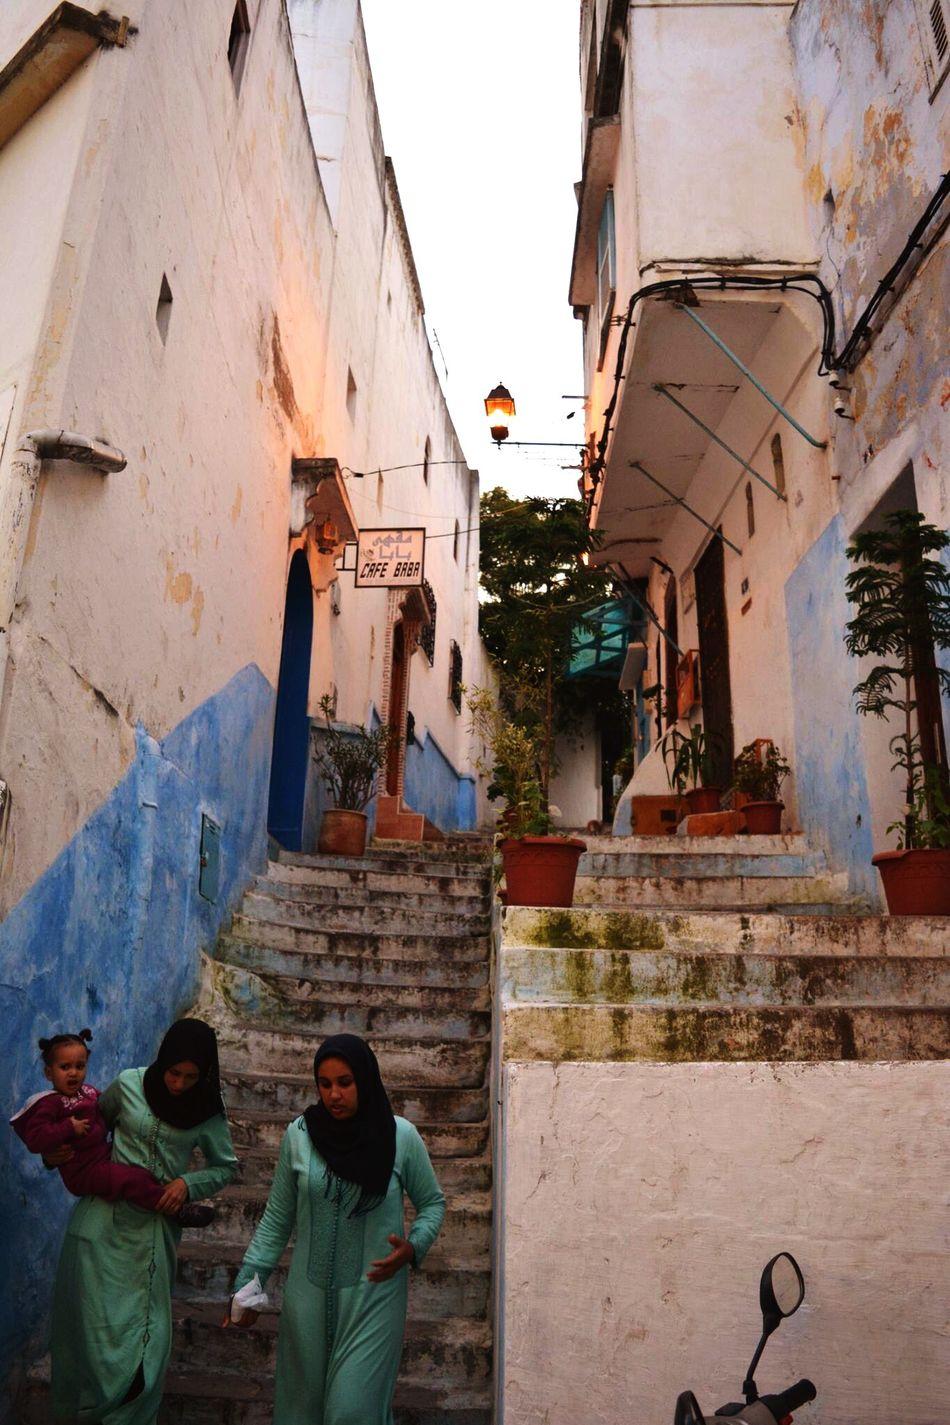 Stairway down Tangier